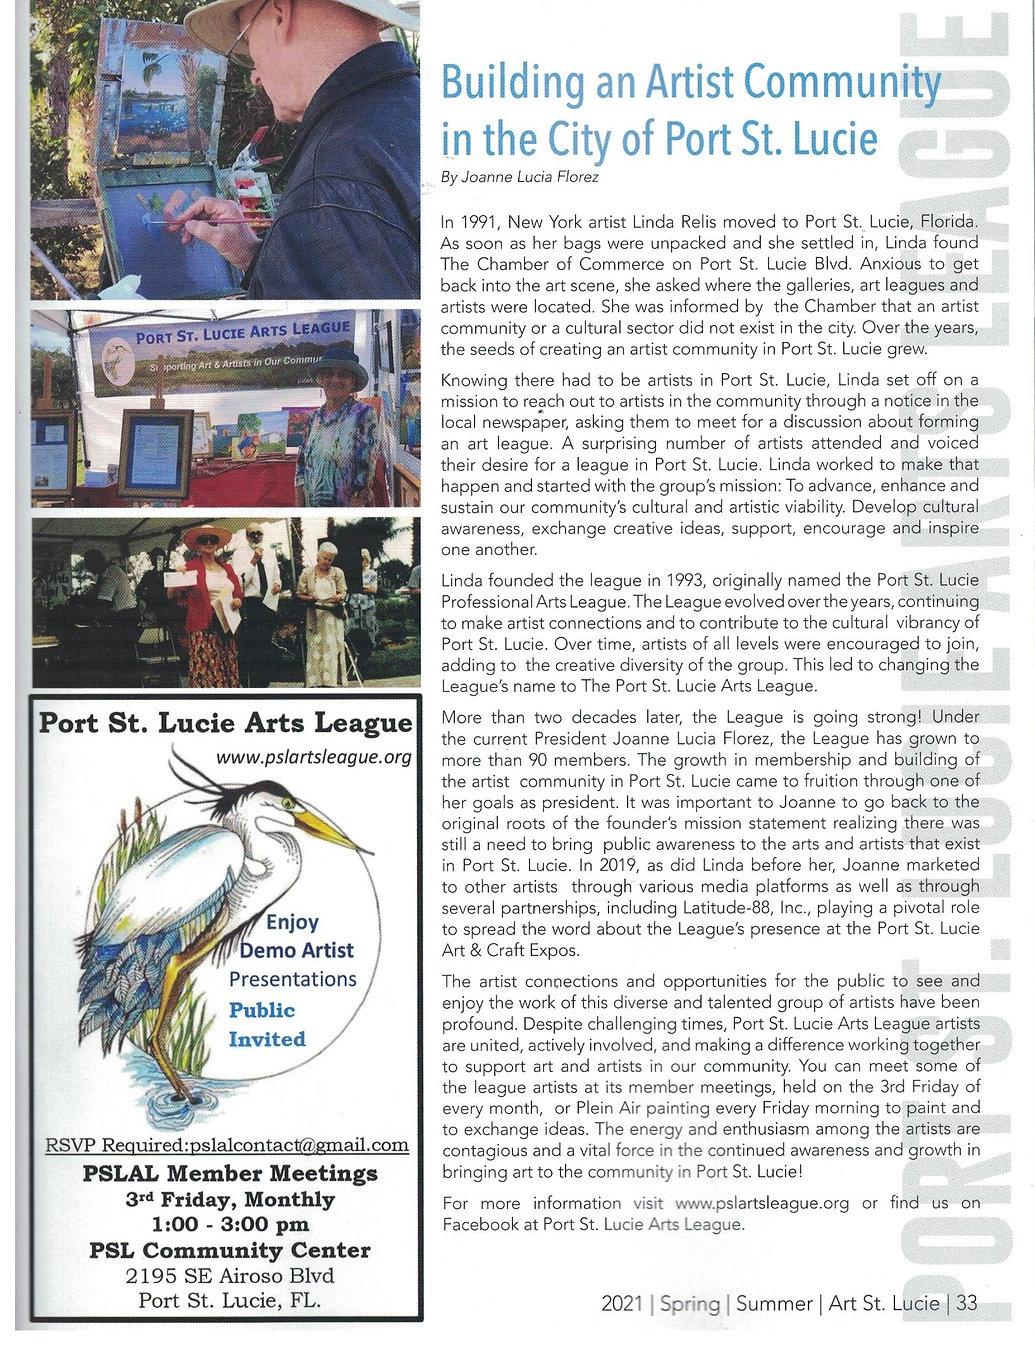 Spring Summerallianc Magazine II.jpg